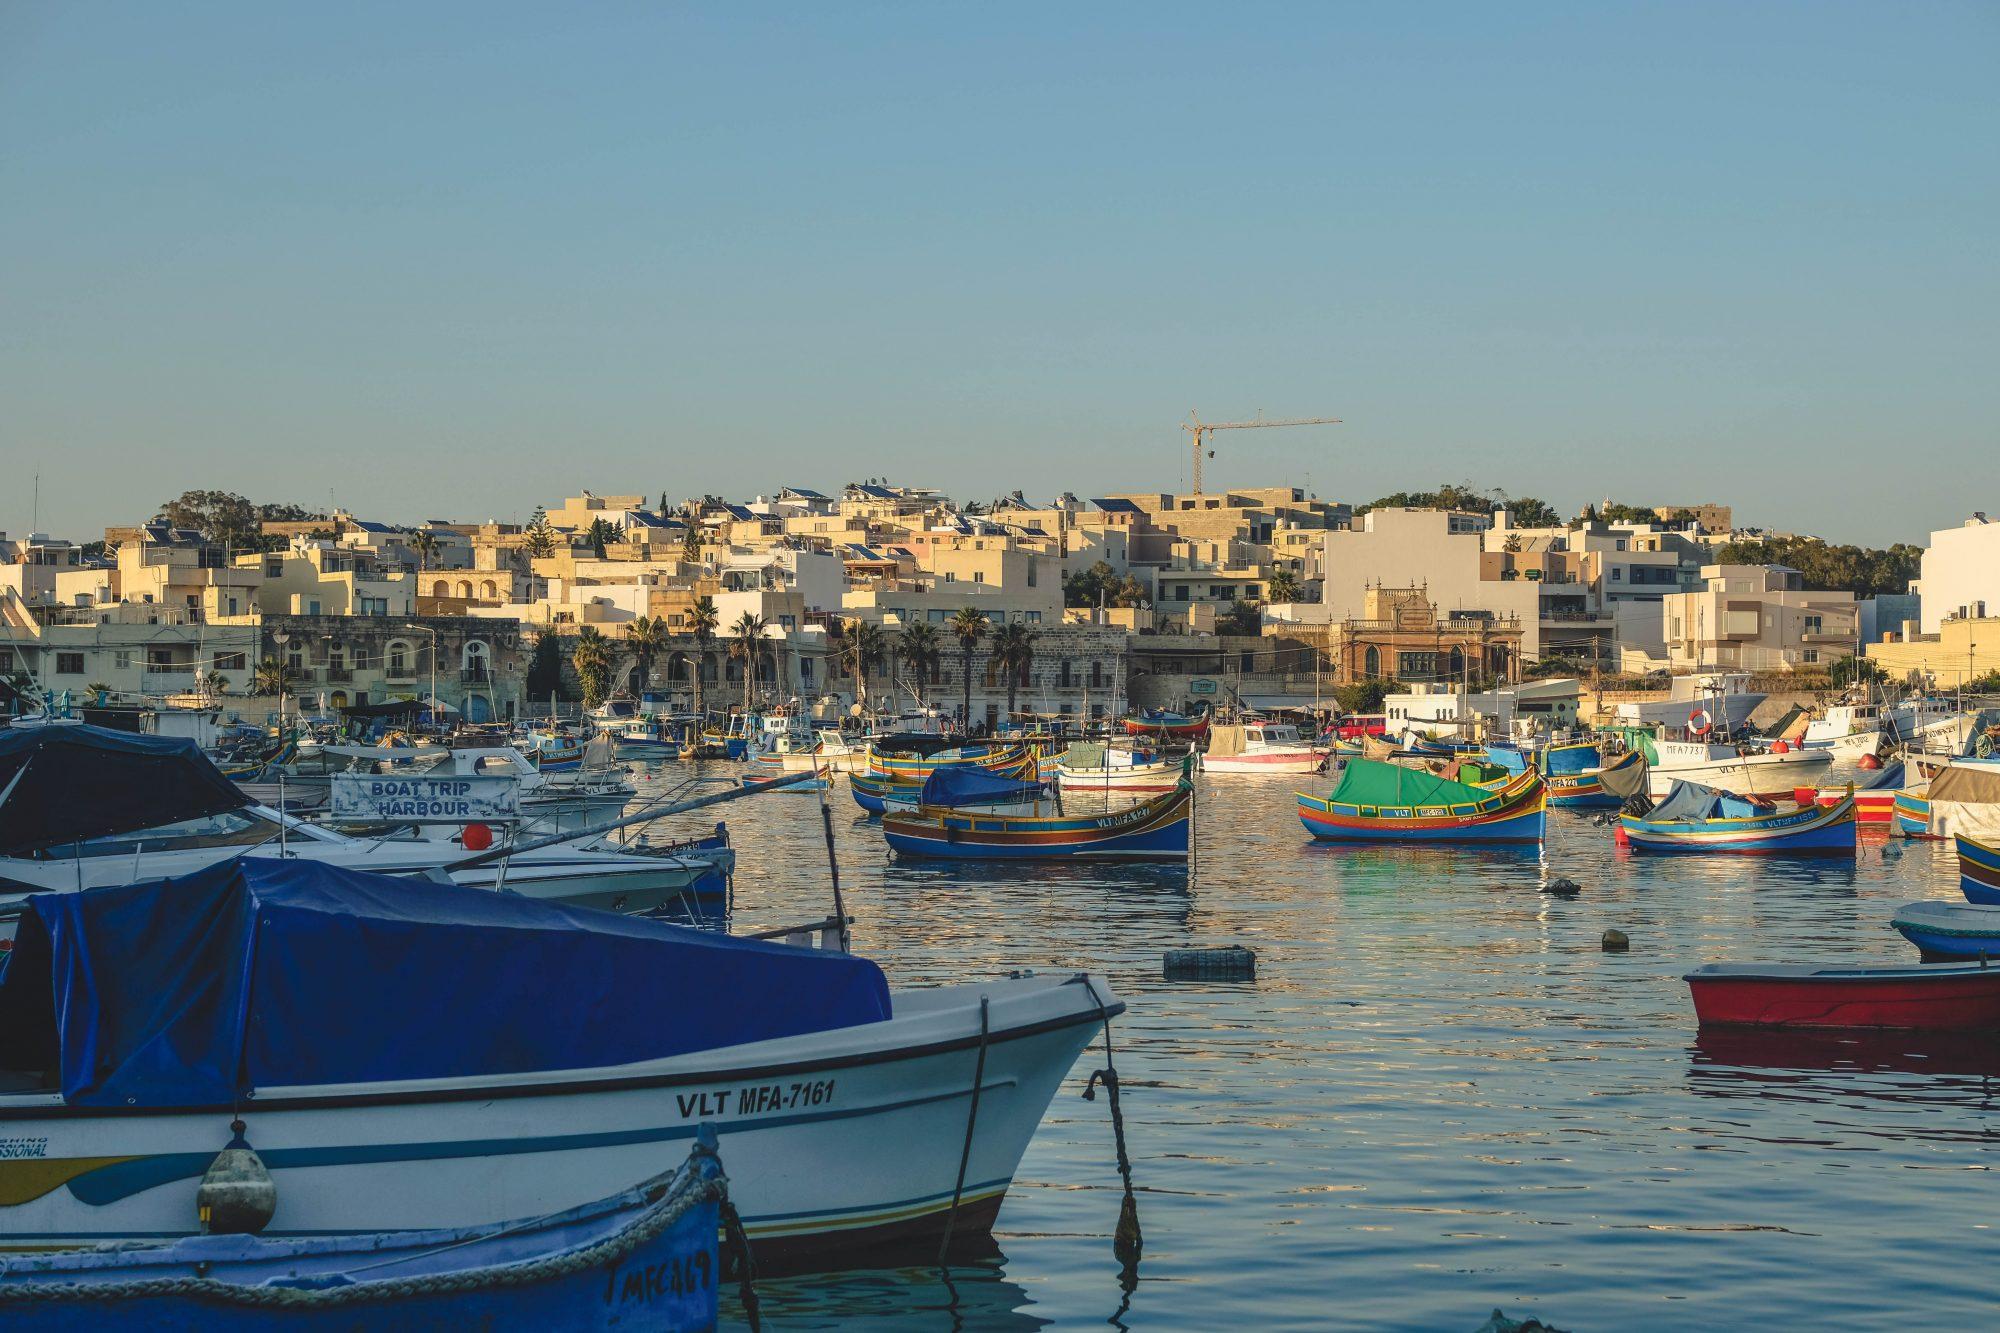 Port de Marsalokx - Marsaxlokk, Malte